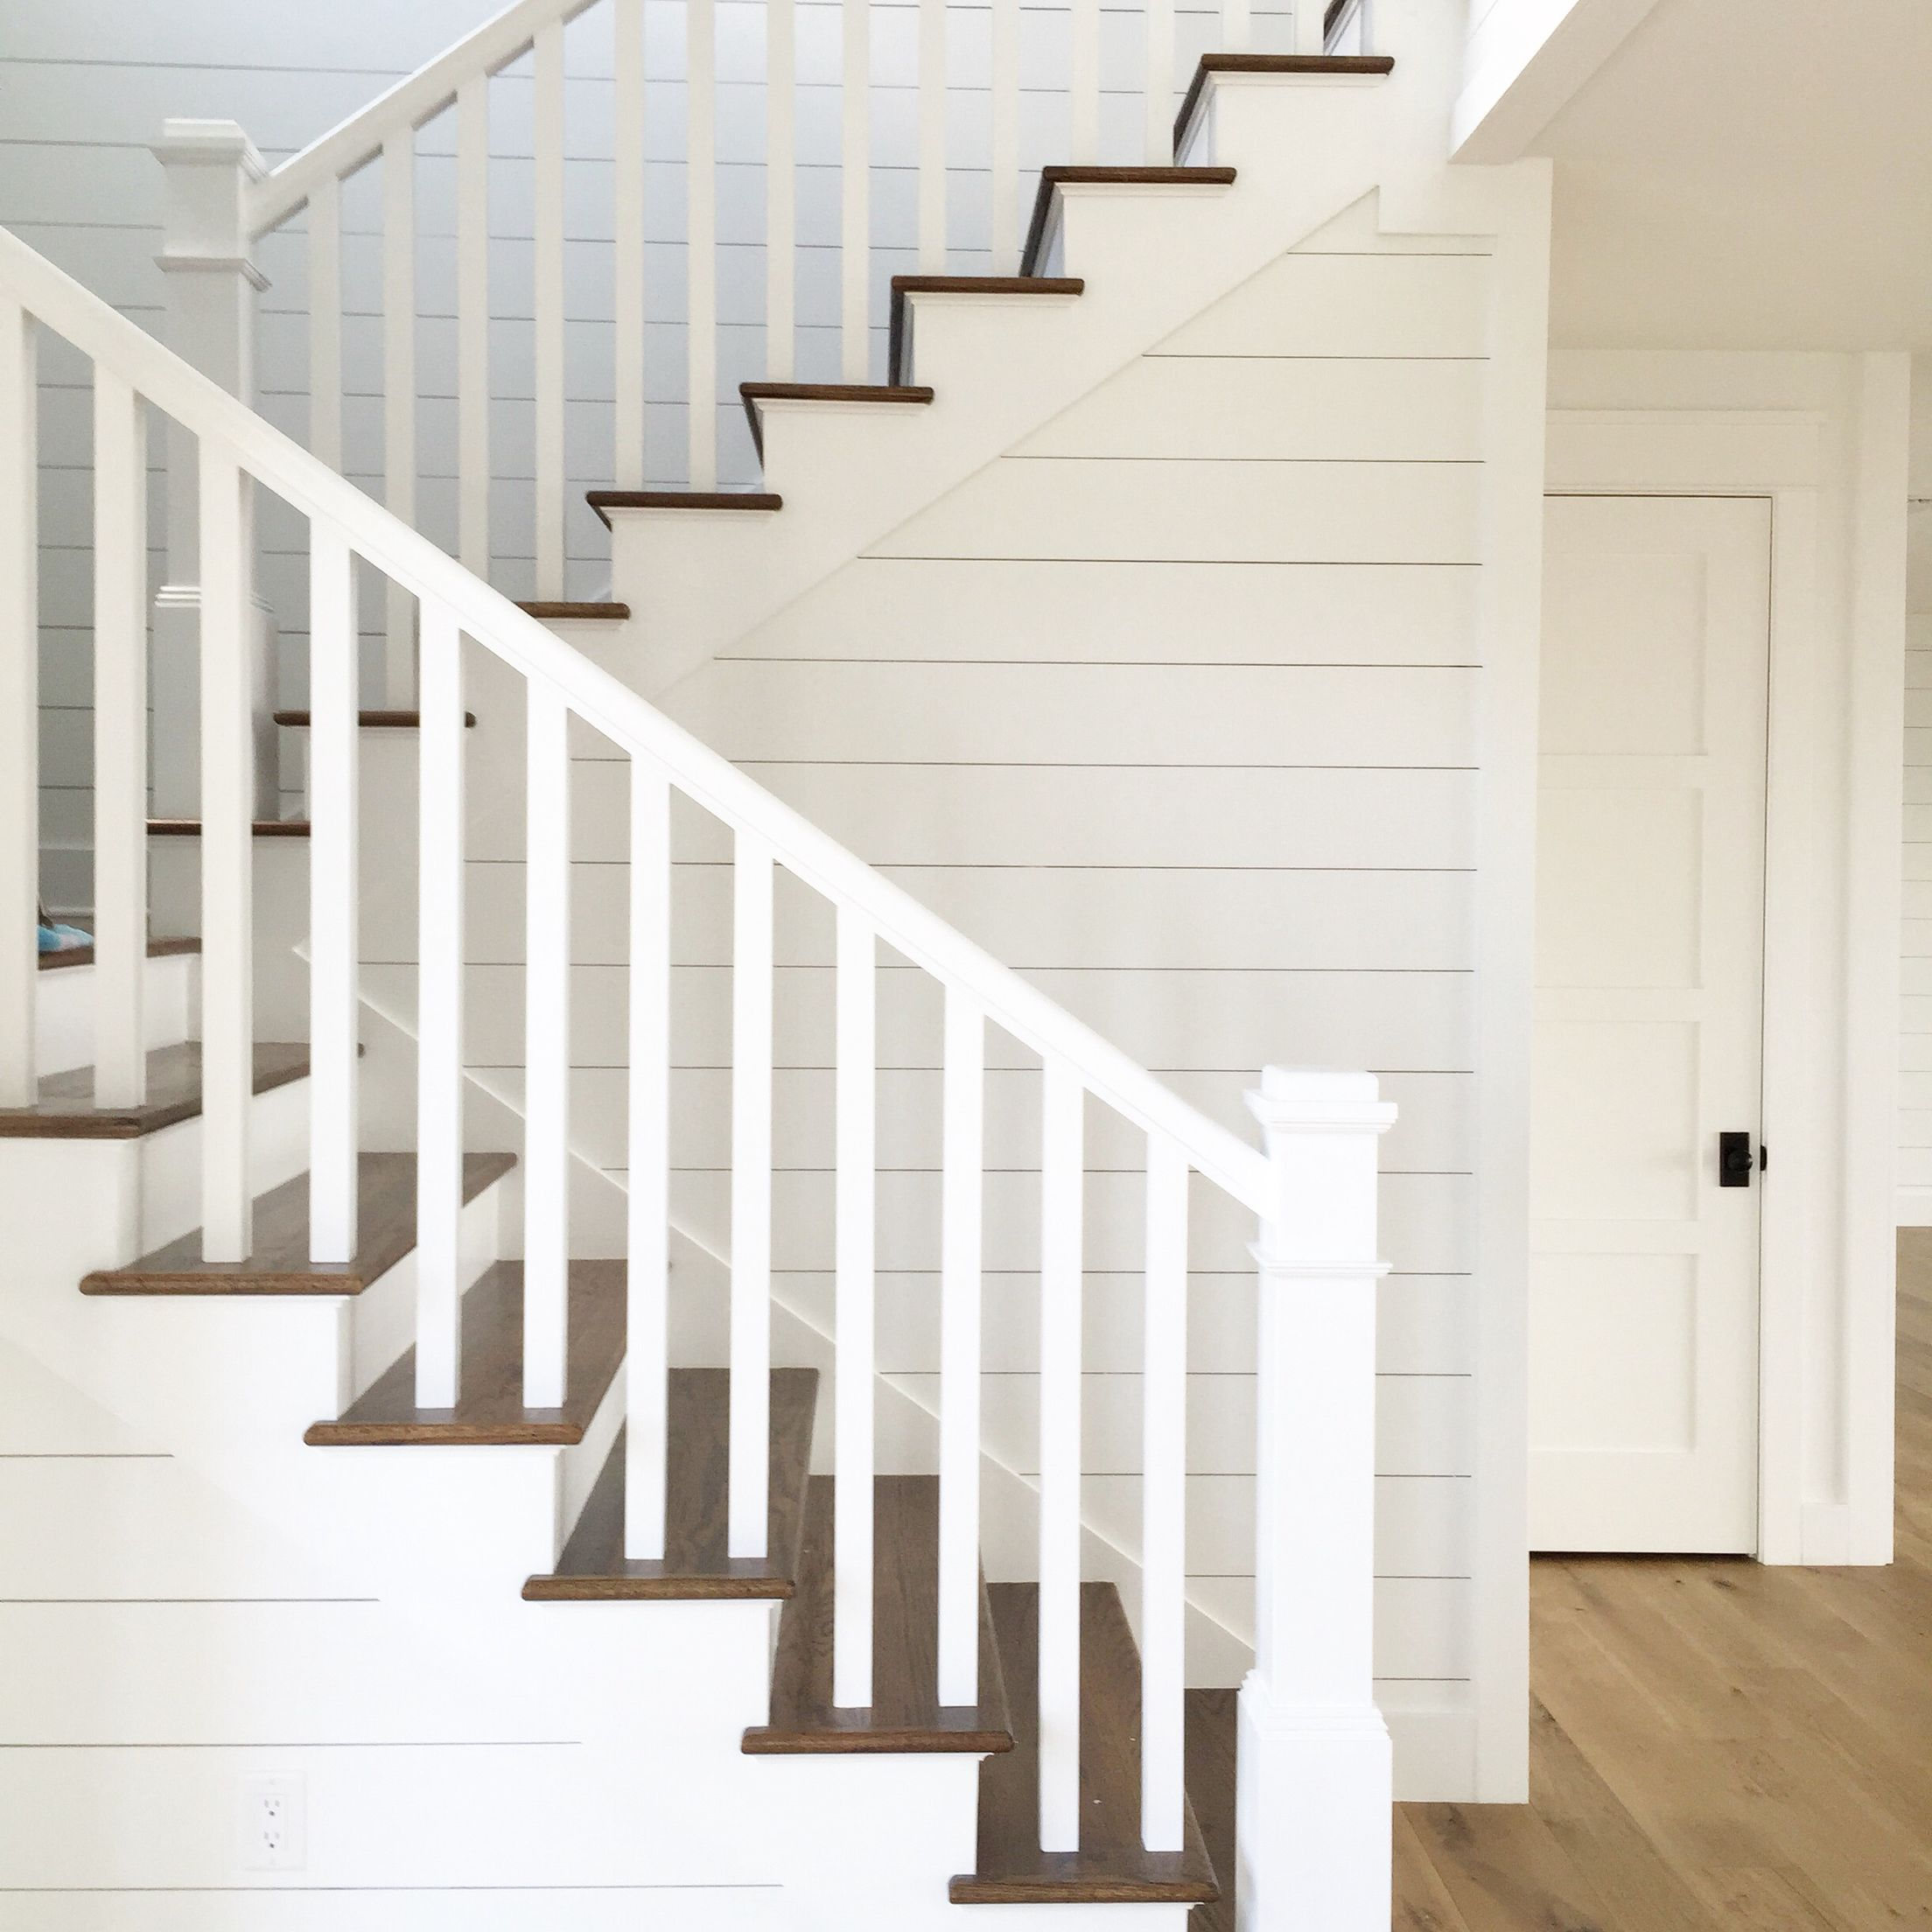 Shiplap Stairs White Oak Flooring Kara Hebert Interiors   Diy Farmhouse Stair Railing   Country Style   U Shaped   Horizontal Bar   Upcycled   Low Cost